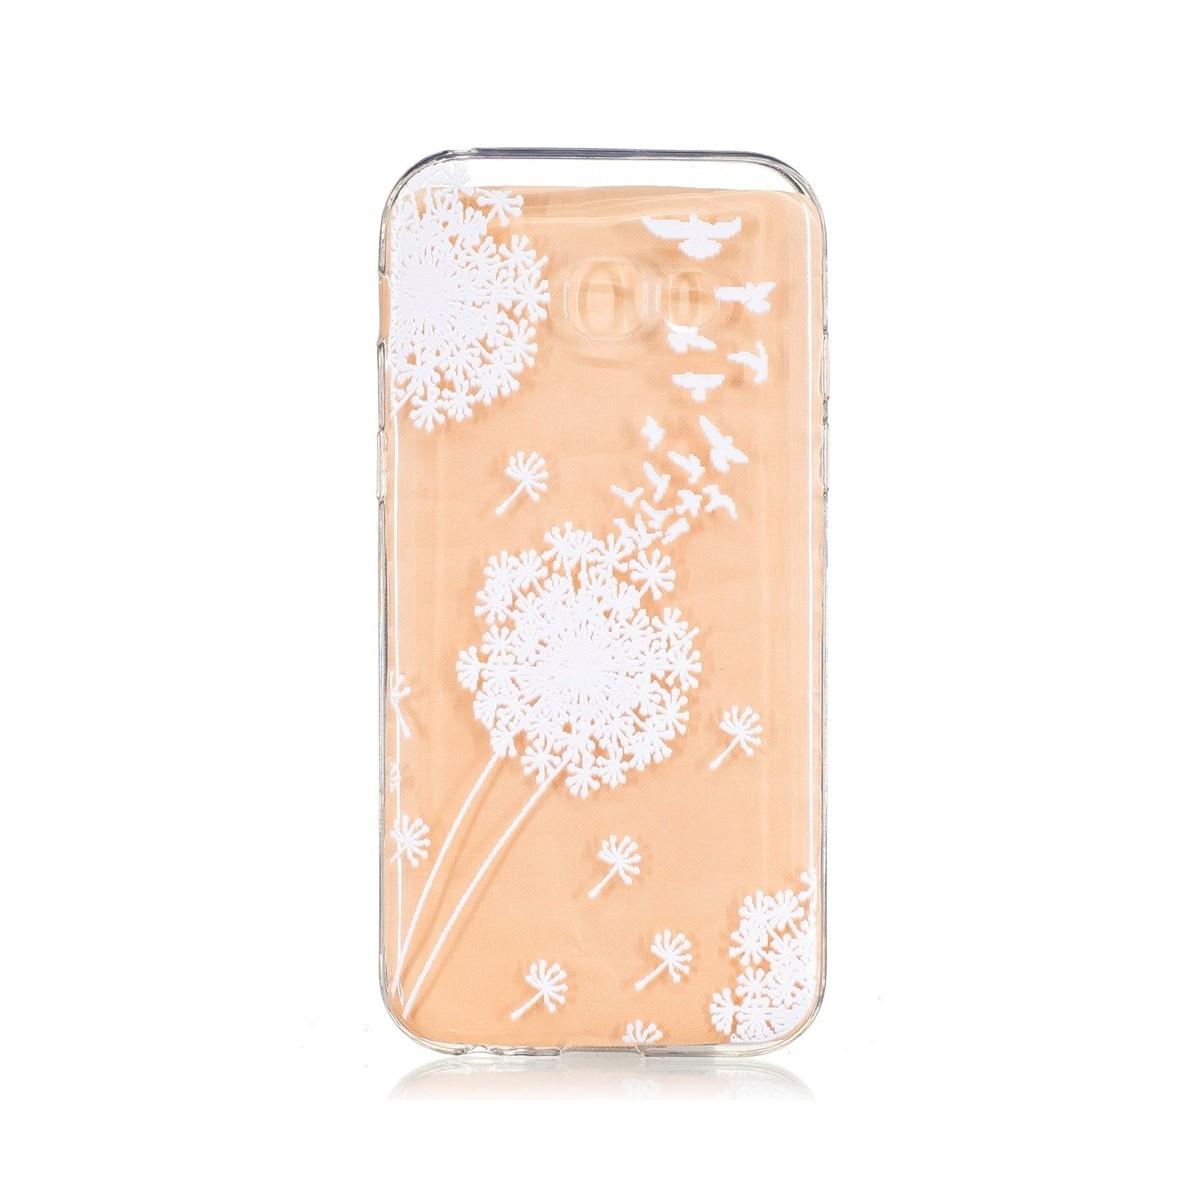 Coque Galaxy A5 (2017) Transparente souple motif Fleurs Blanches - Crazy Kase